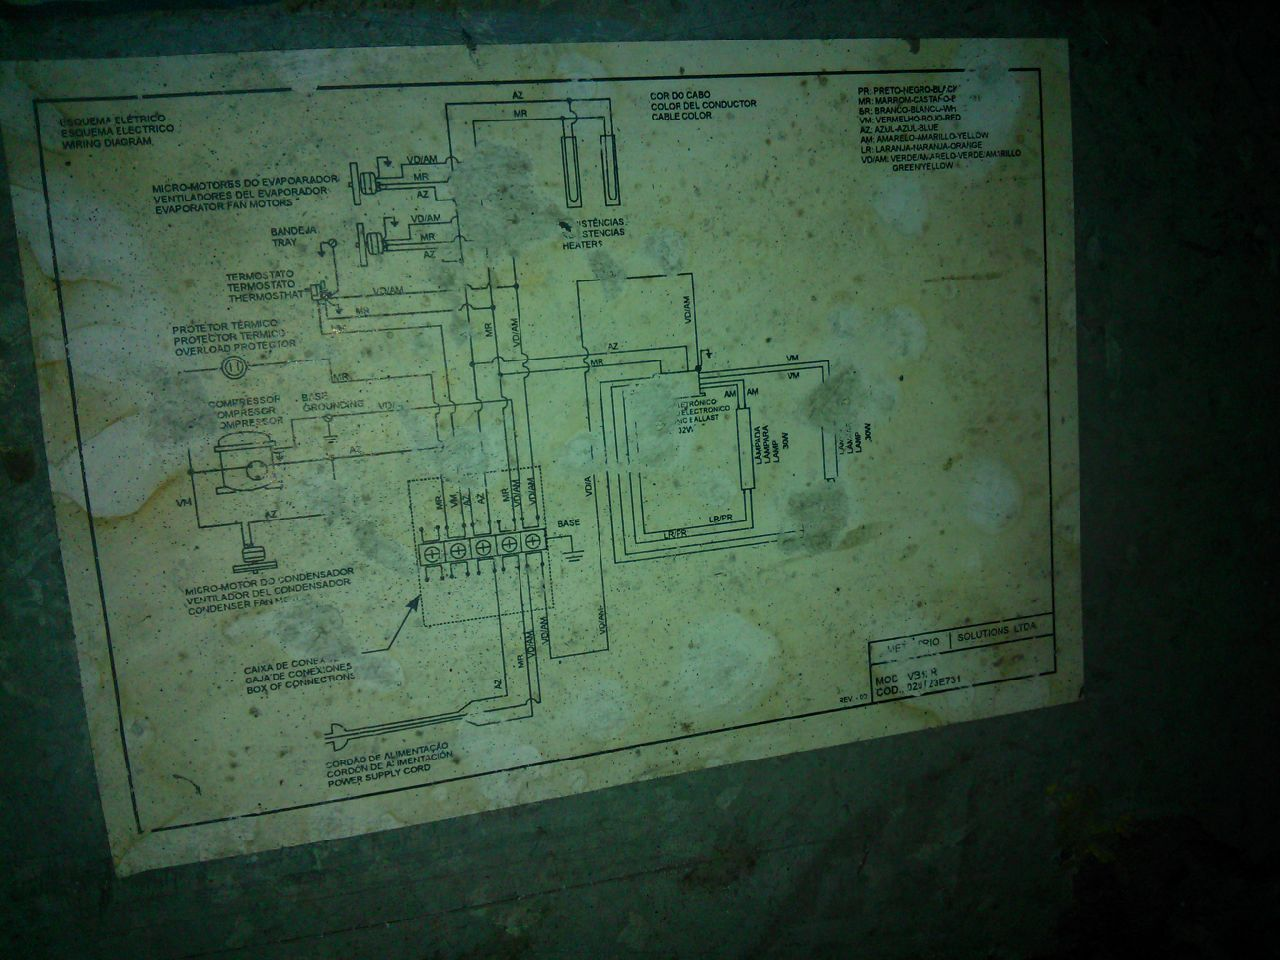 Circuito Electrico Heladera Comercial : Heladera exhibidora no enfría yoreparo